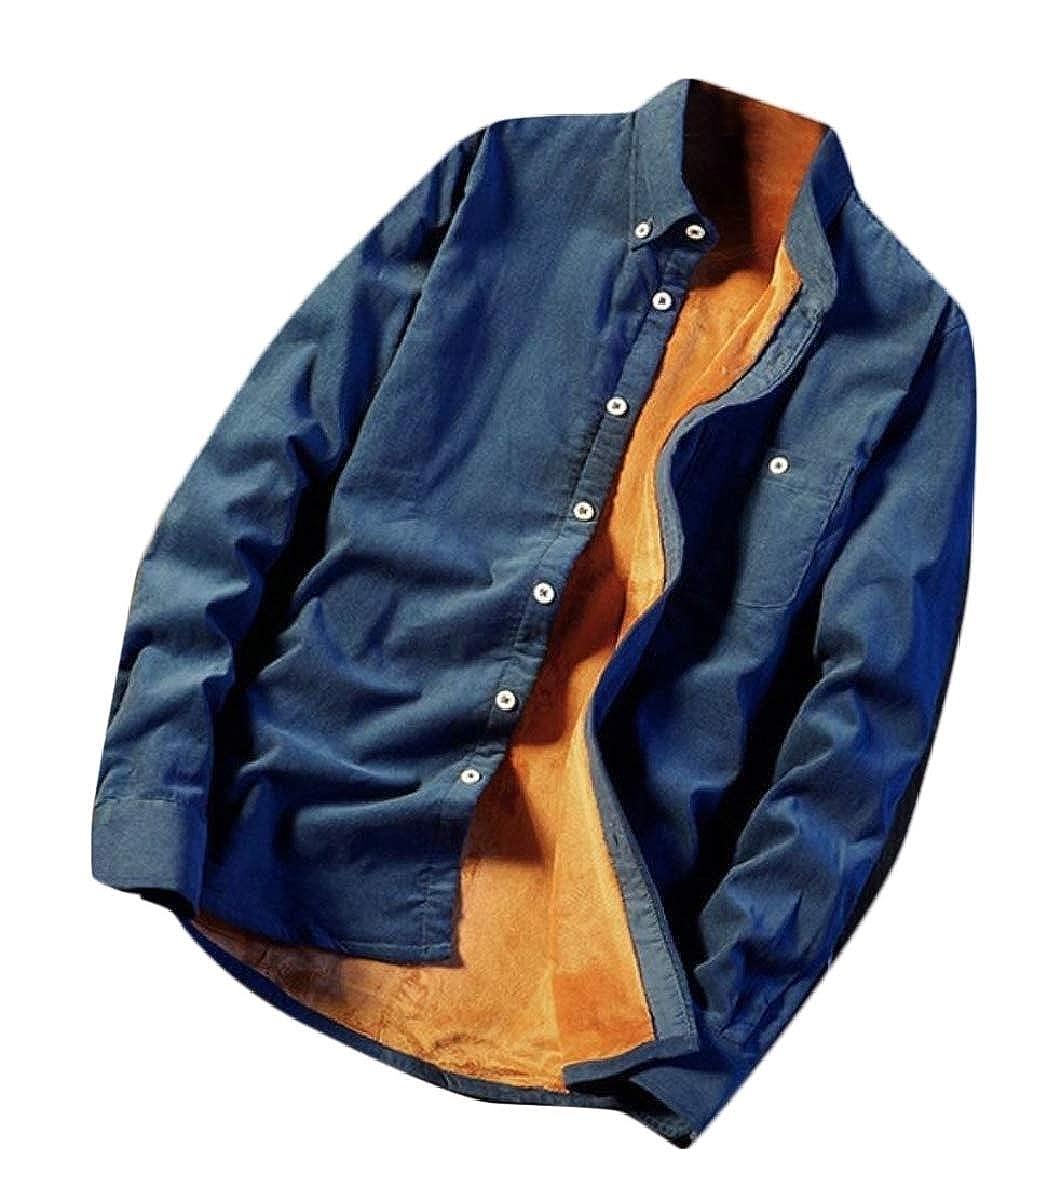 pujingge Mens Warm Solid Thick Fleece Corduroy Button Down Dress Shirts